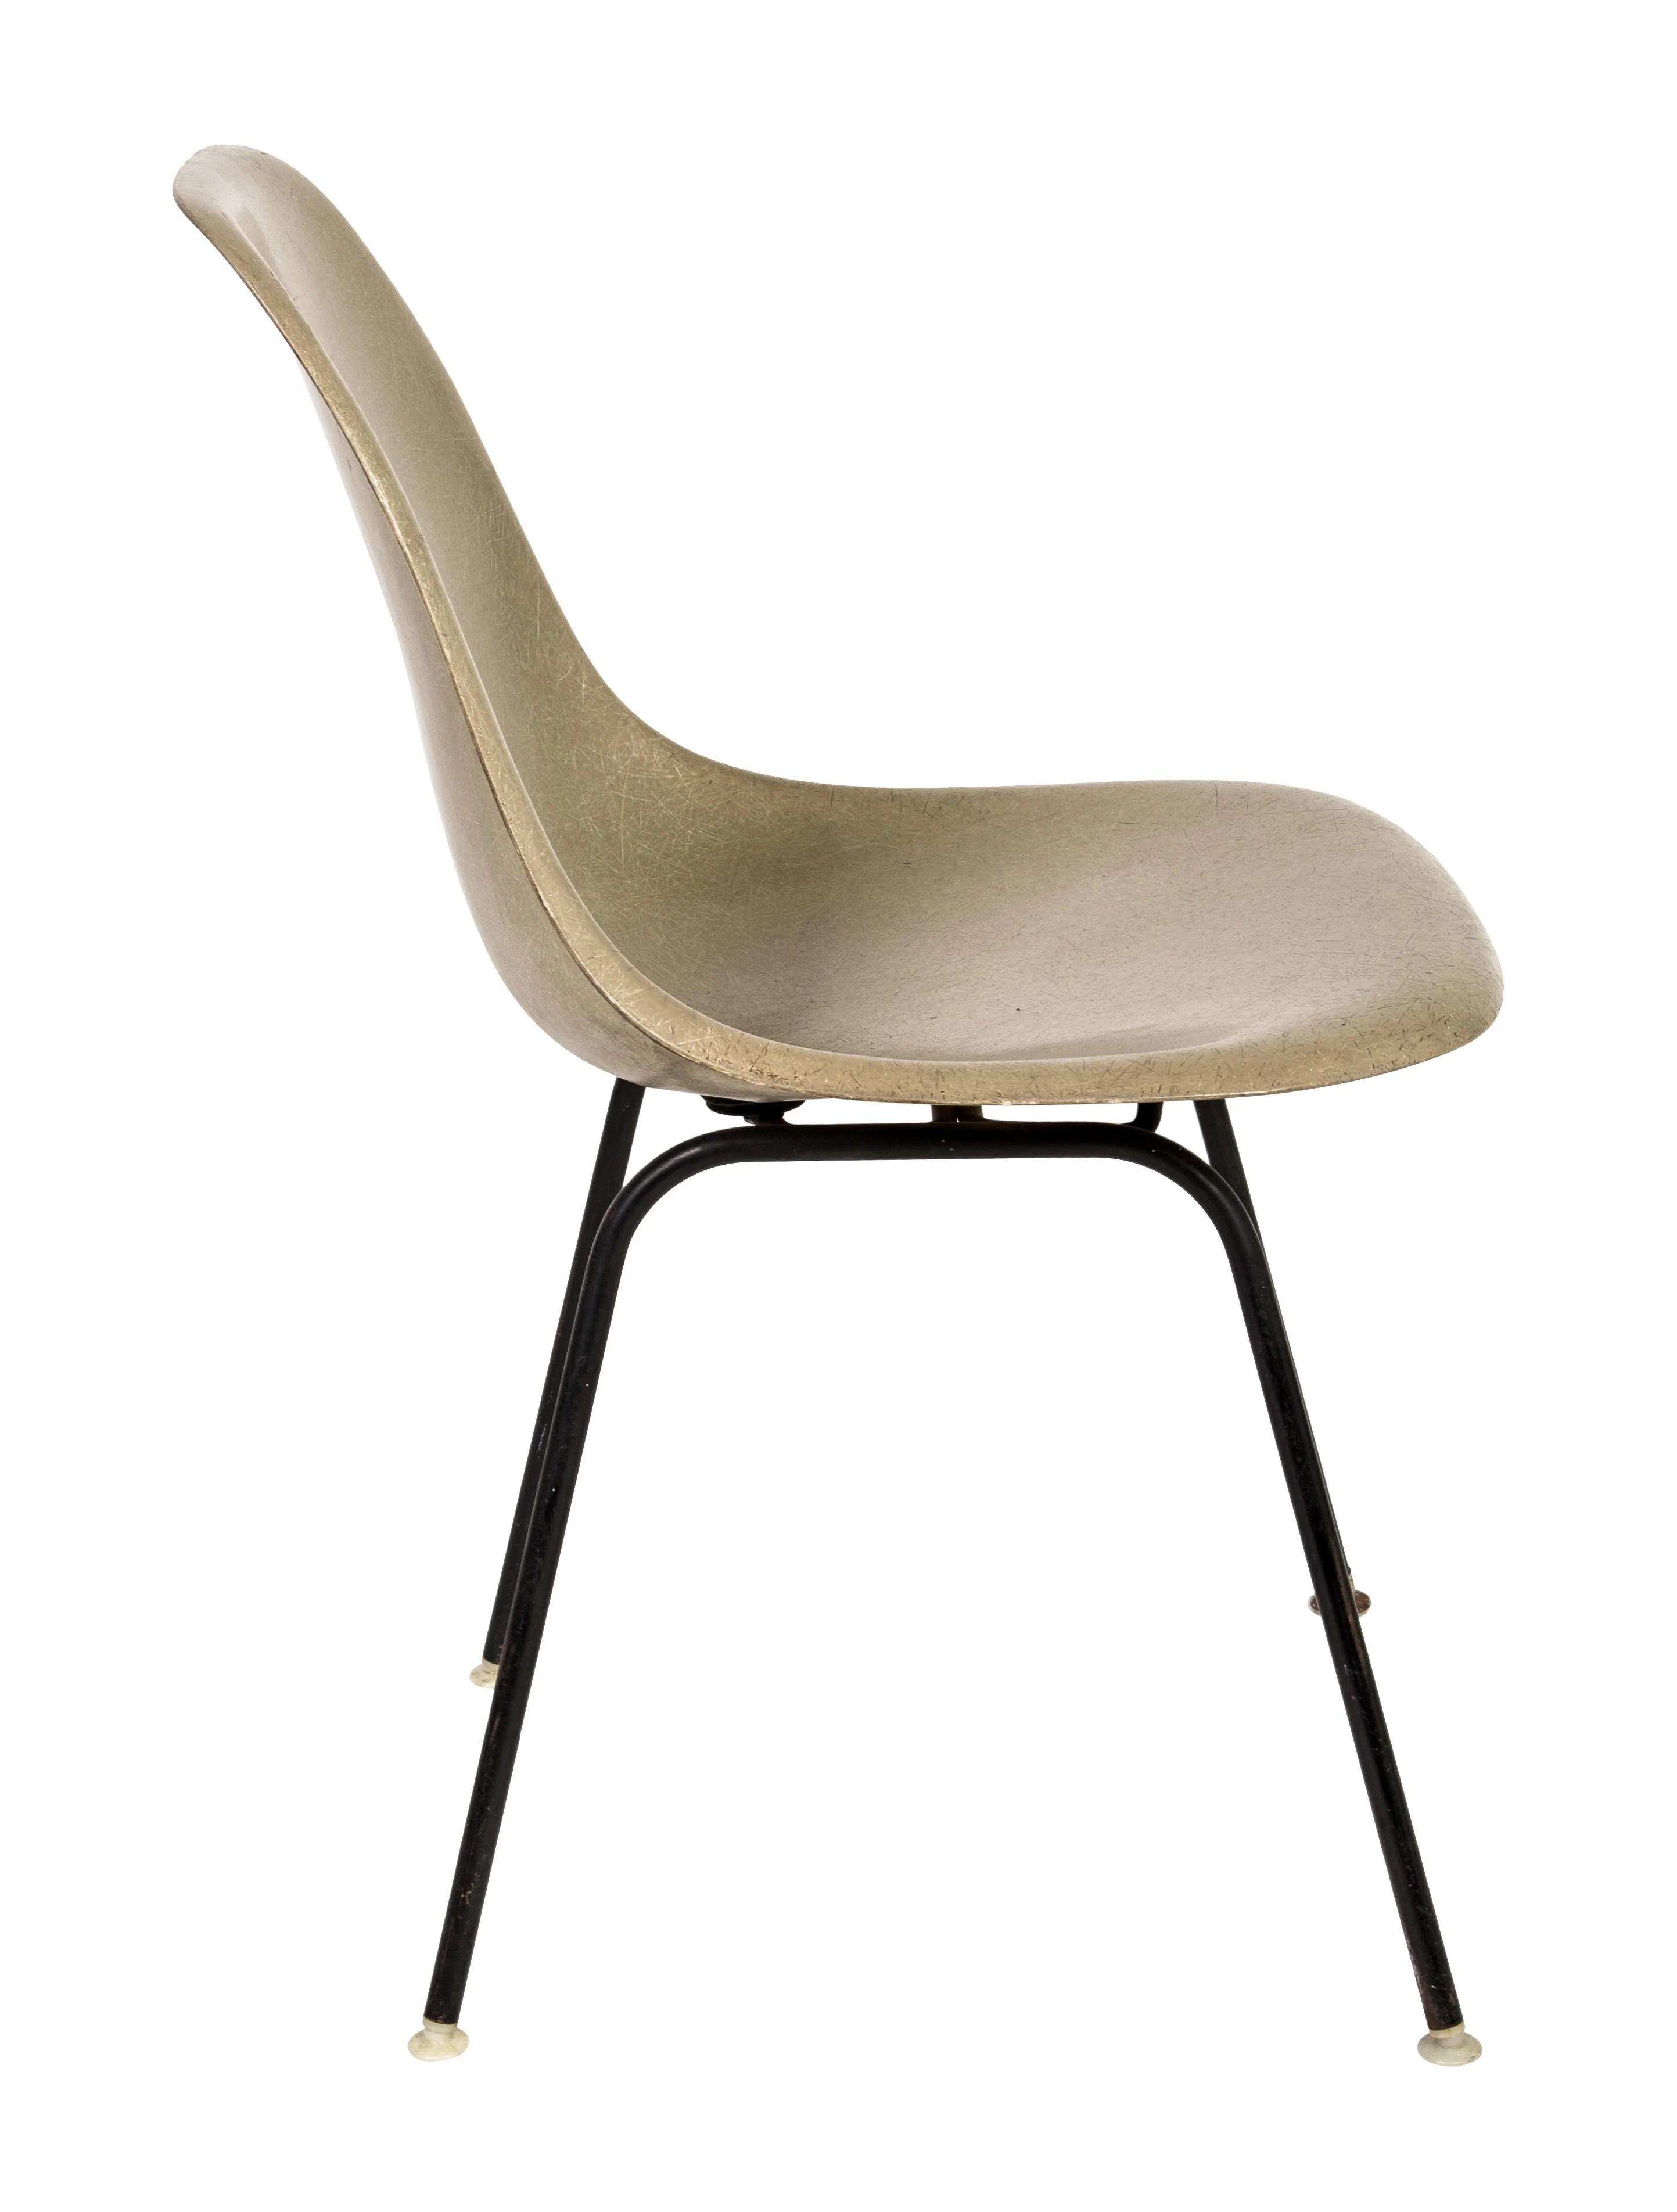 Herman Miller Vintage Eames Molded Fiberglass Chair